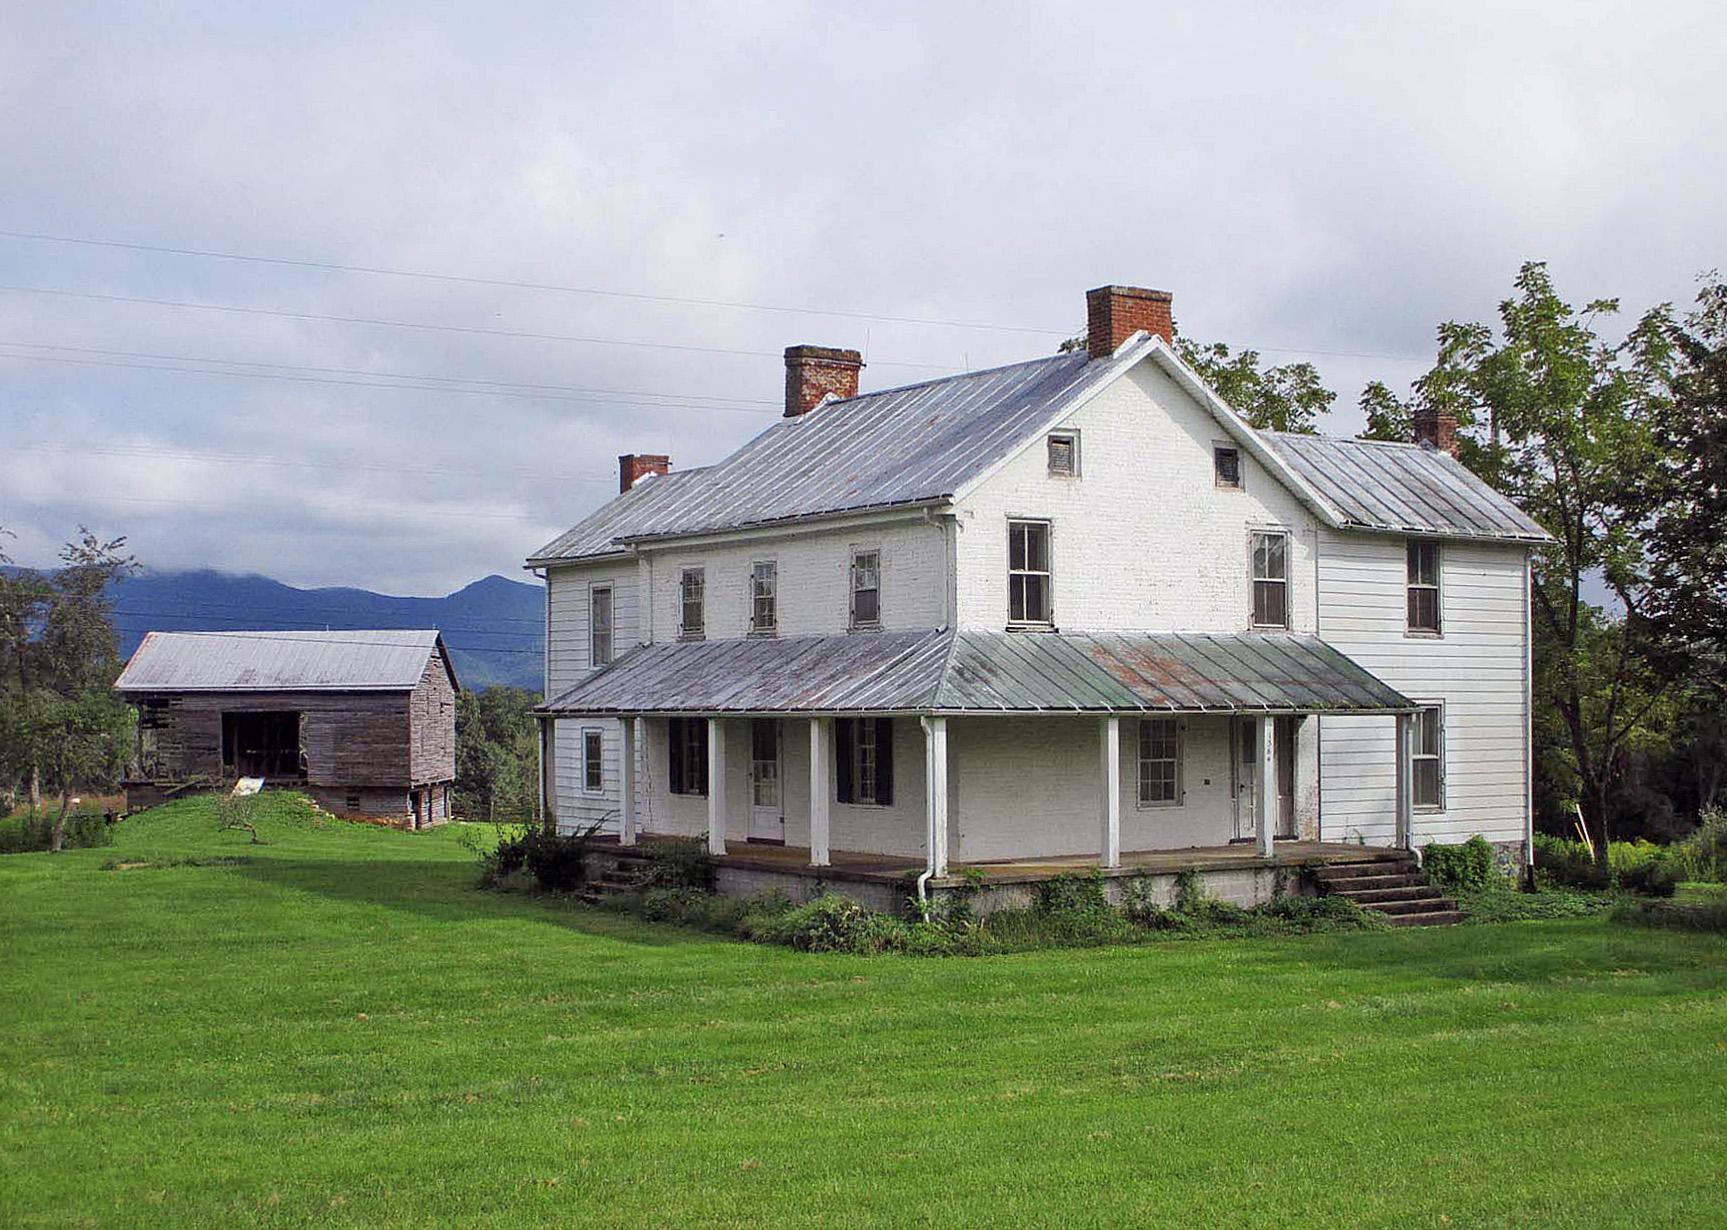 Taylor-Kinnear Farm